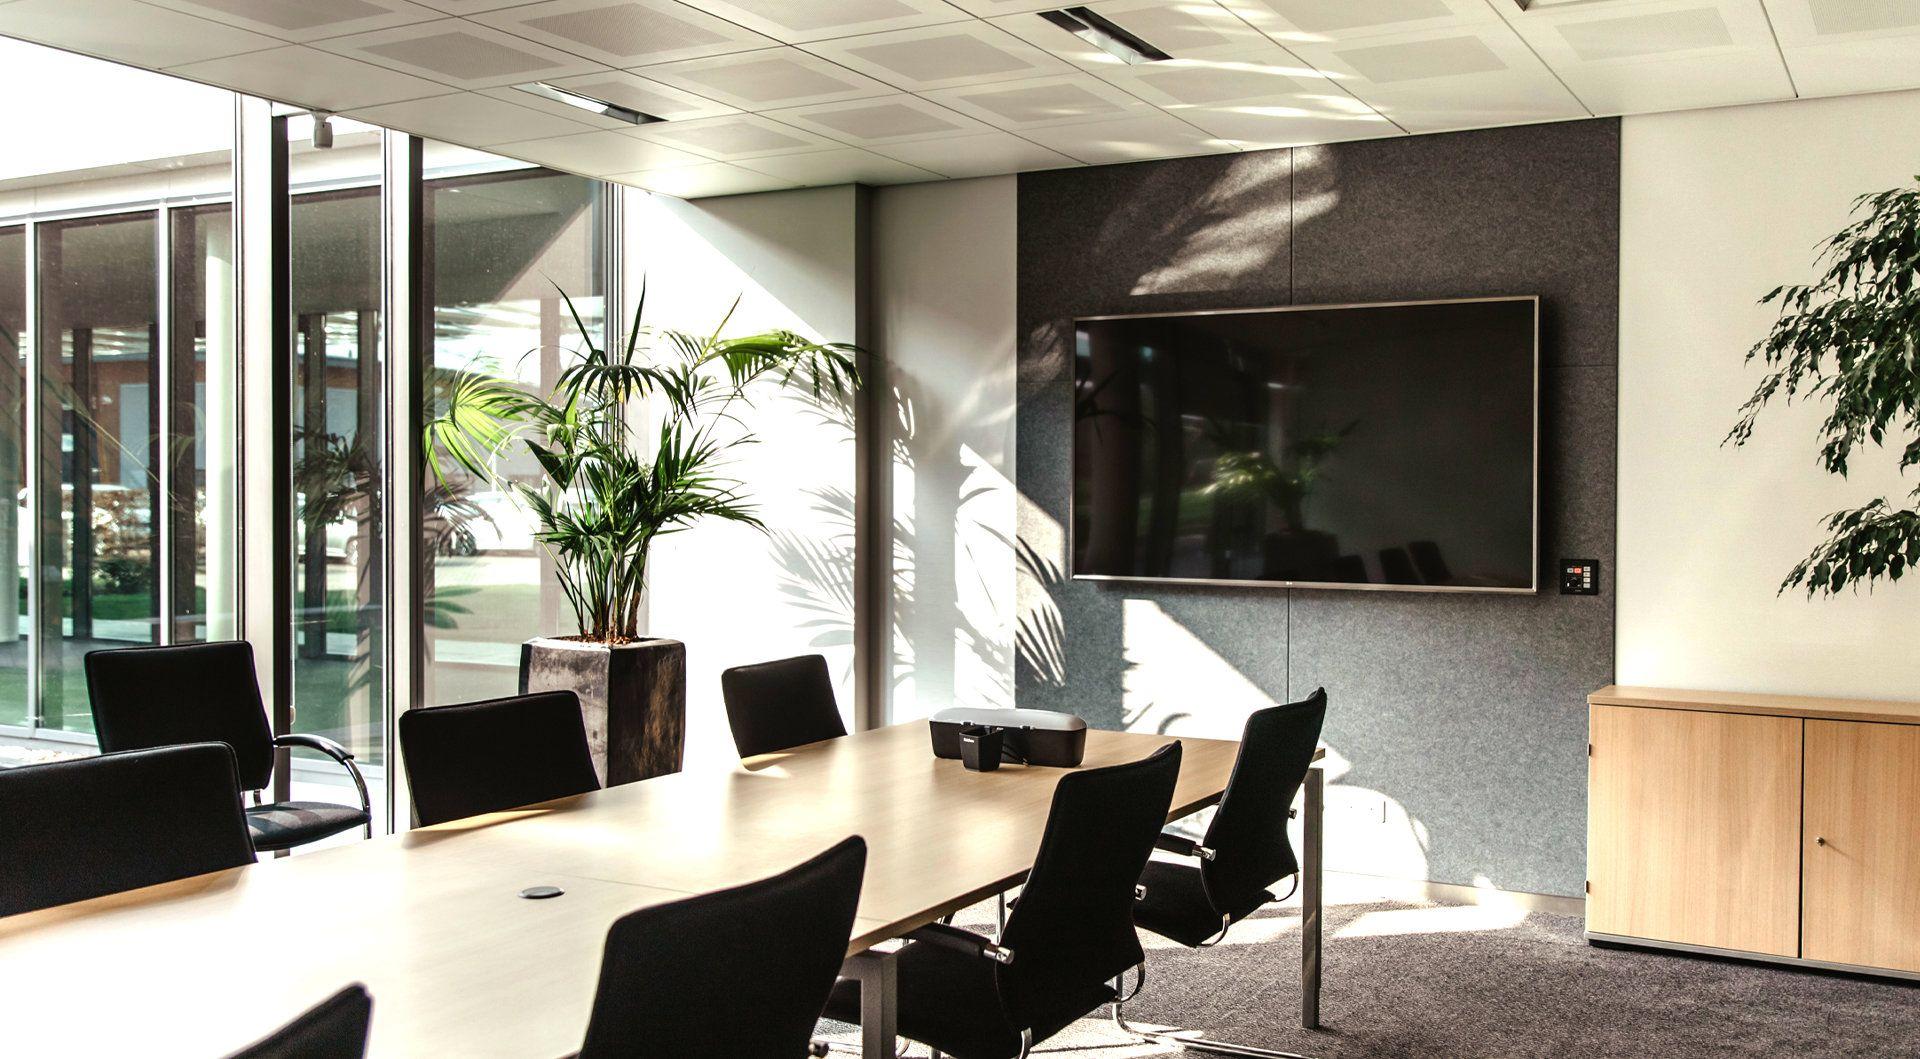 "Conen Mounts SCETANHVV14 flat panel vloer standaard 2,54 m (100"") Draagbare flatscreen vloerstandaard Aluminium, Zwart - Case studie de vries"